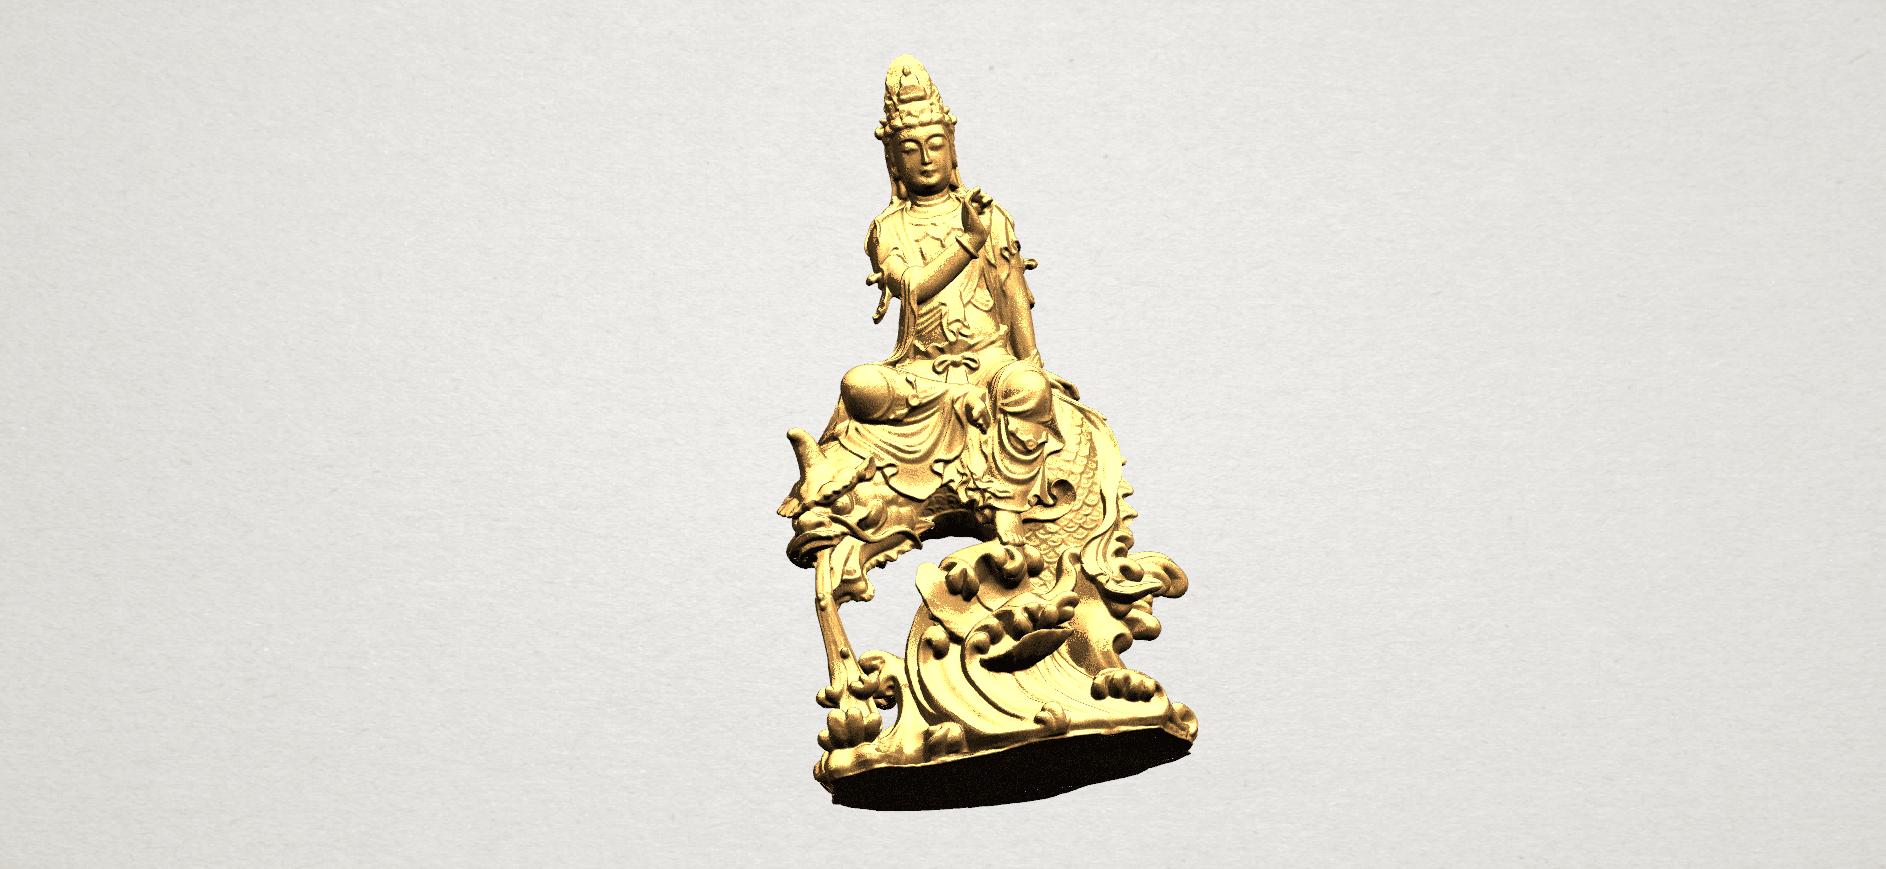 Avalokitesvara Bodhisattva (with fish) 88mm - A10.png Télécharger fichier 3DS gratuit Avalokitesvara Bodhisattva (avec poisson) 01 • Modèle imprimable en 3D, GeorgesNikkei